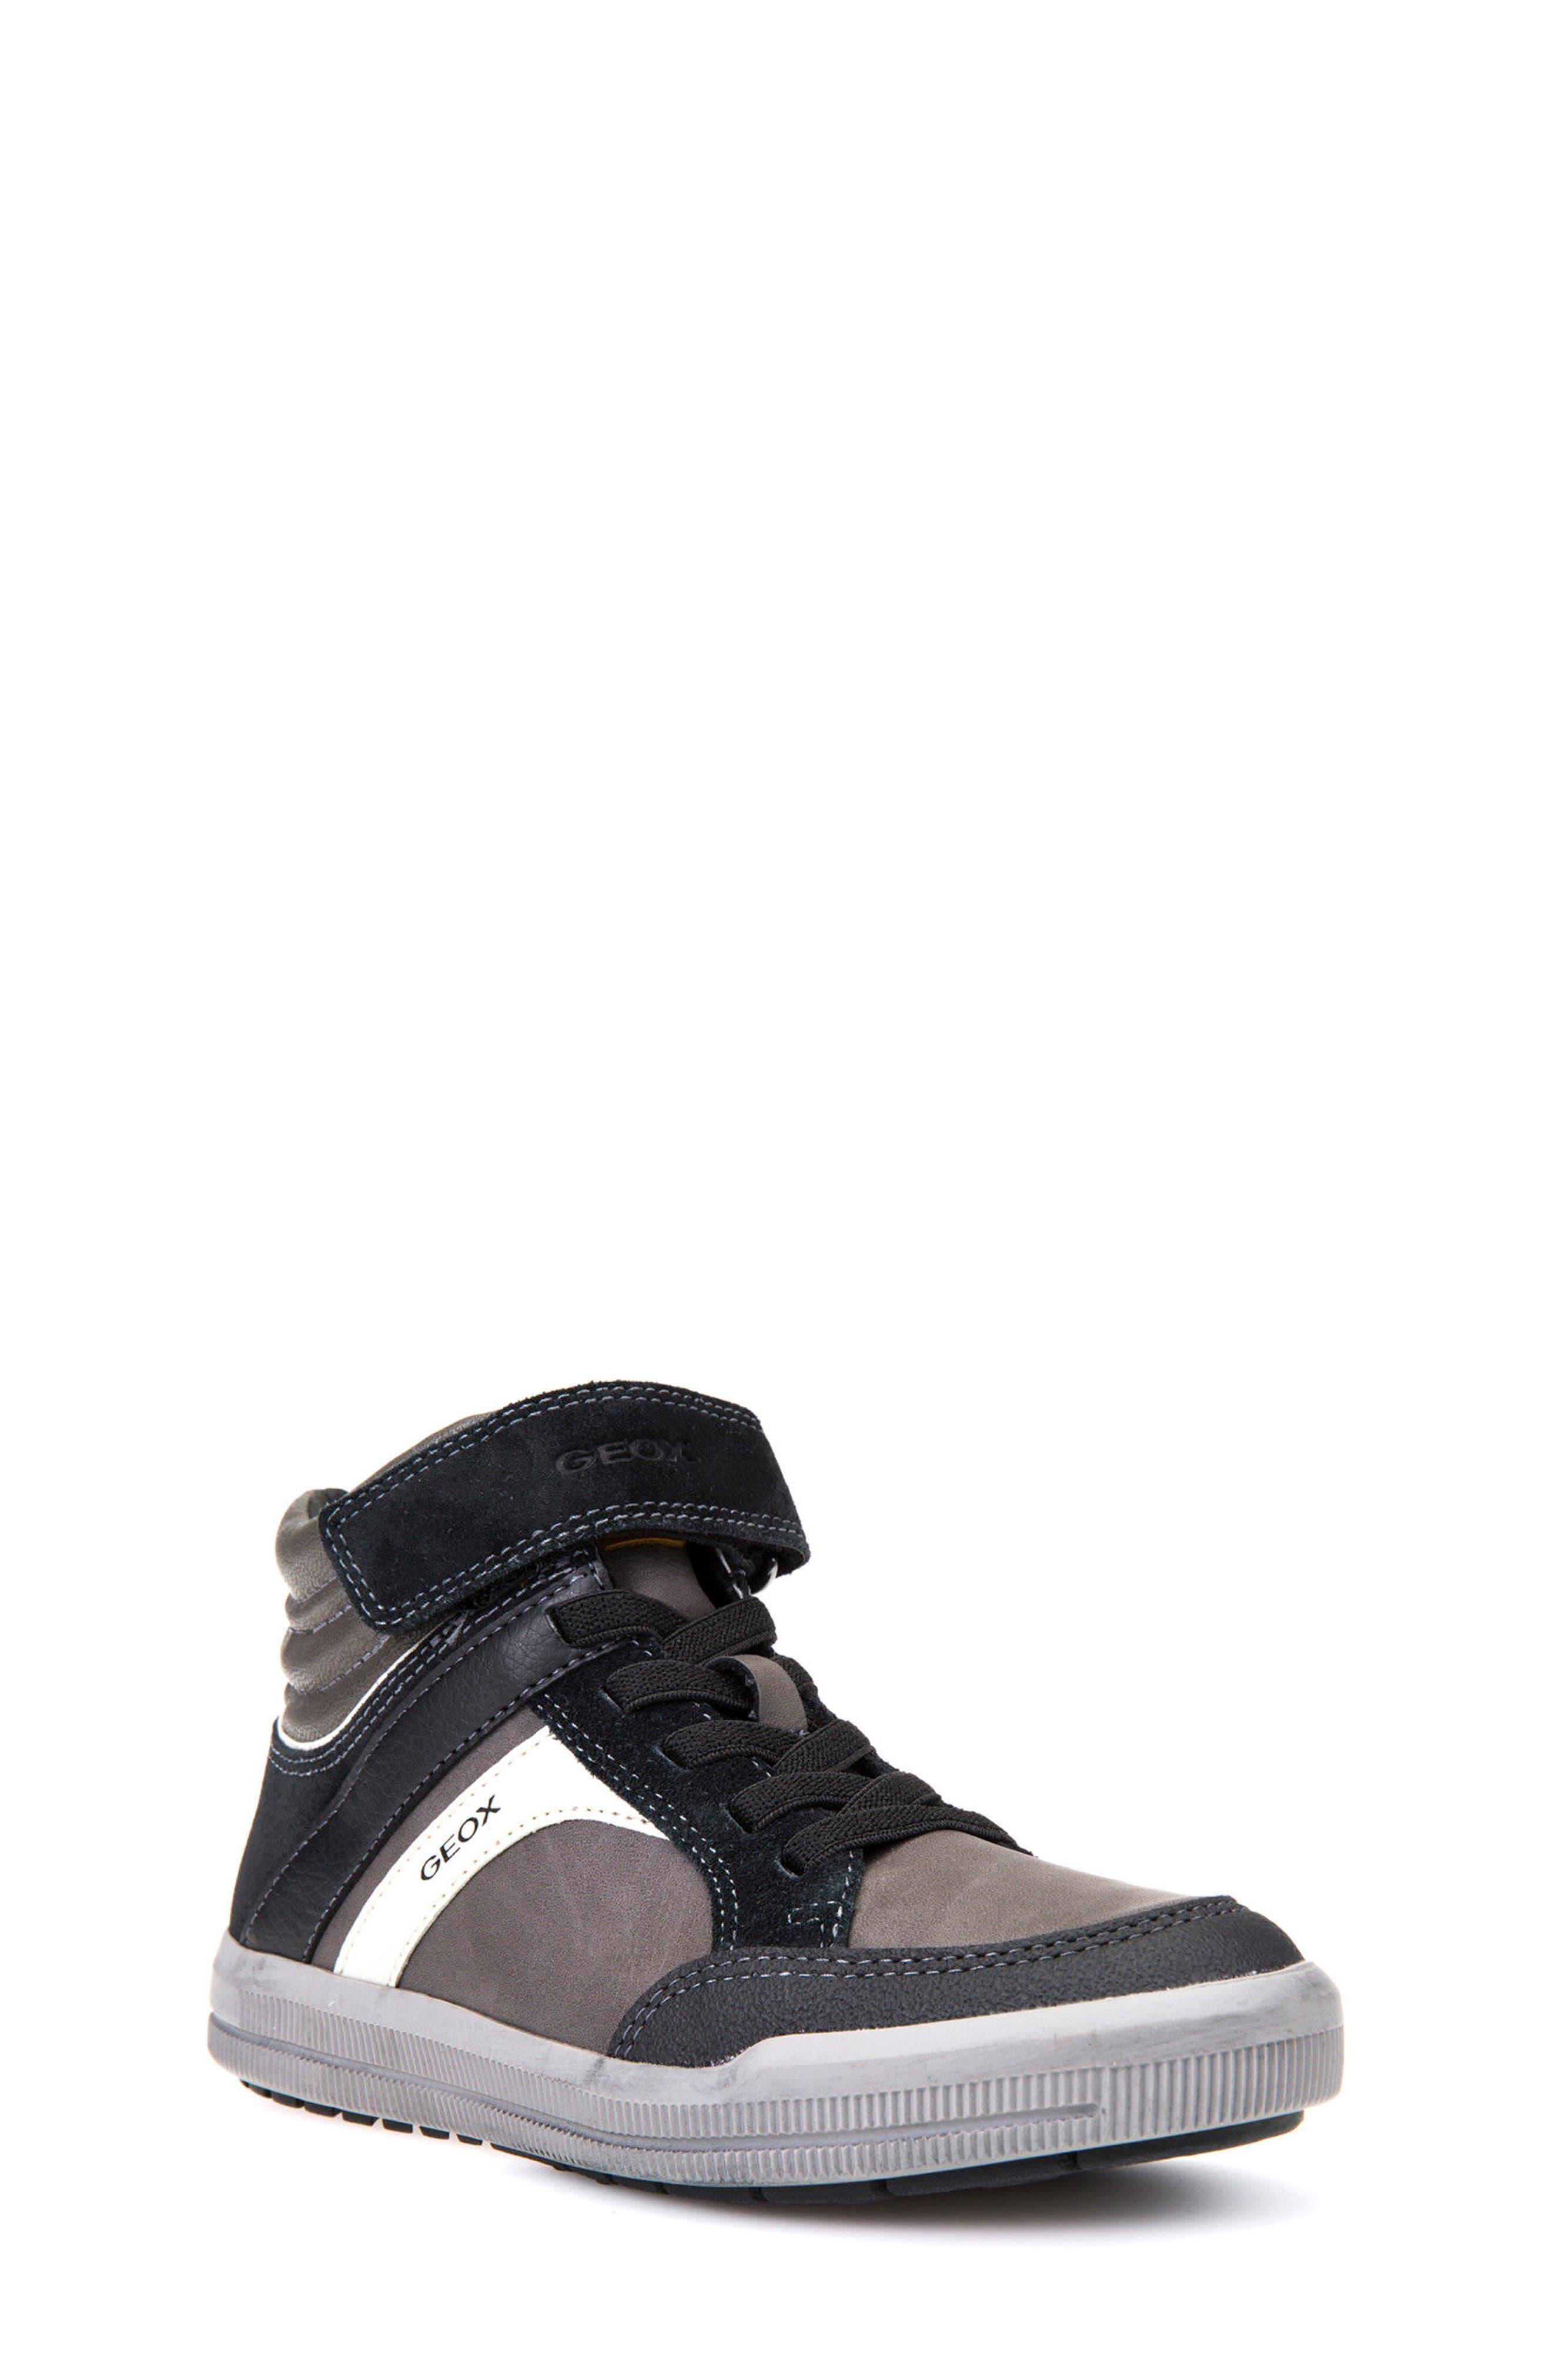 Geox Arzach Mid Top Sneaker (Toddler, Little Kid & Big Kid)